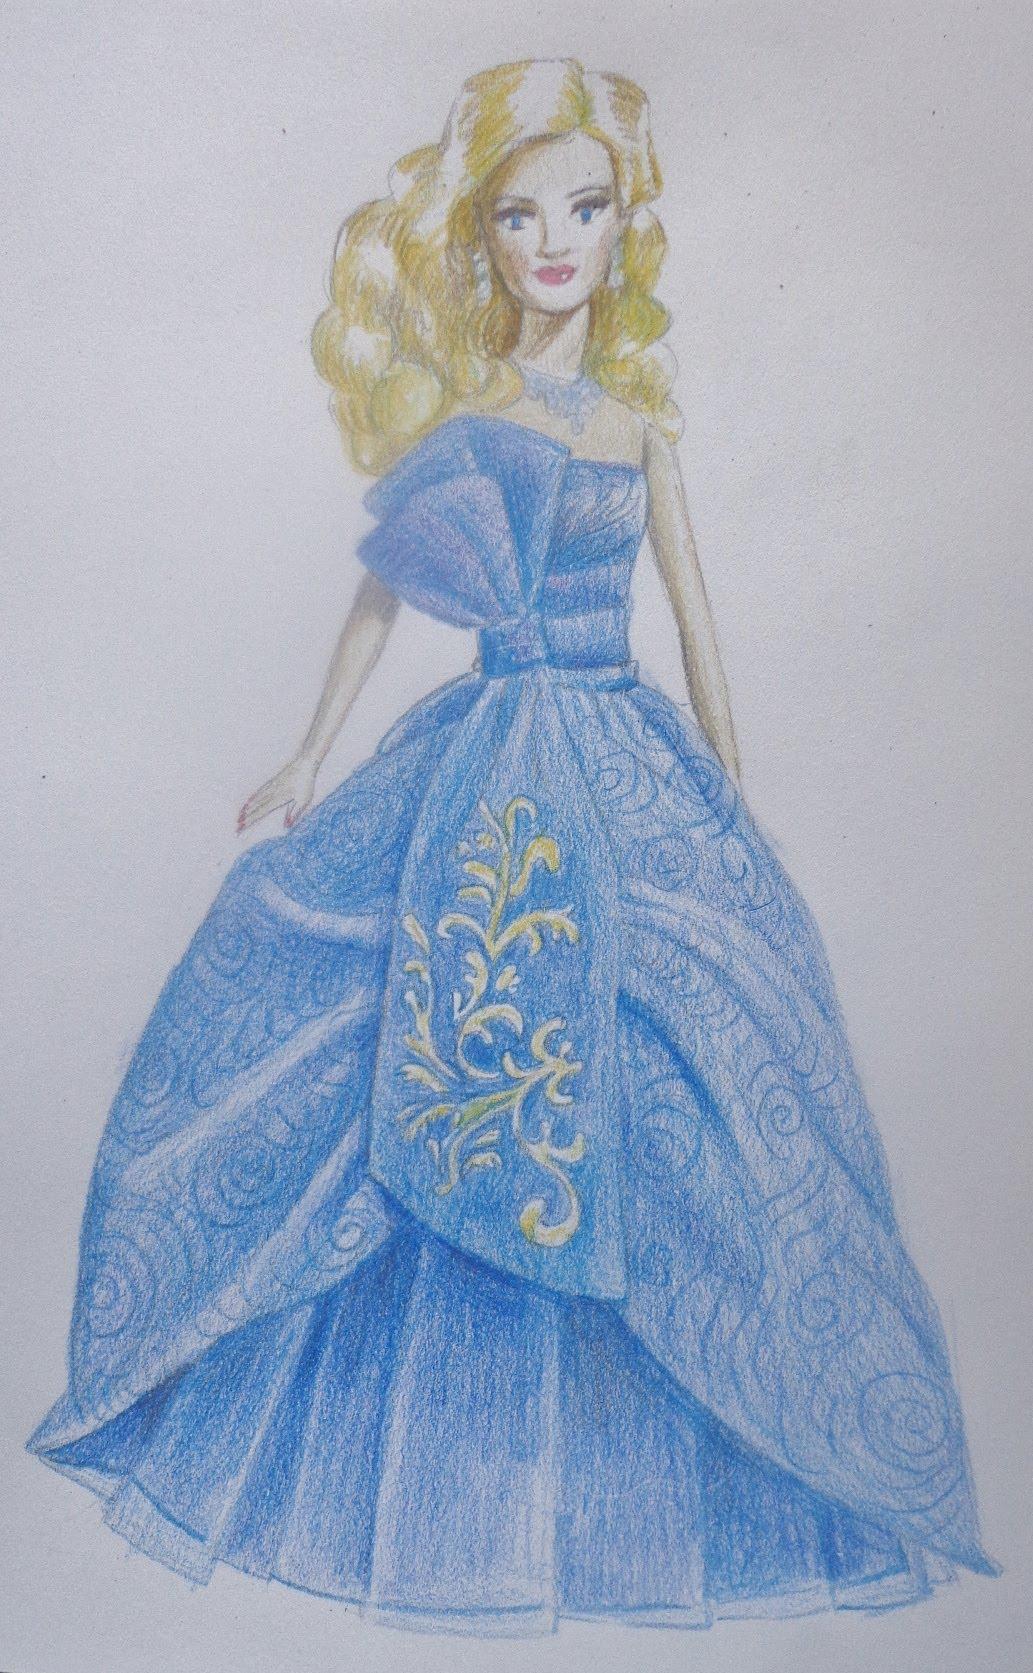 1033x1673 How To Draw A Barbie